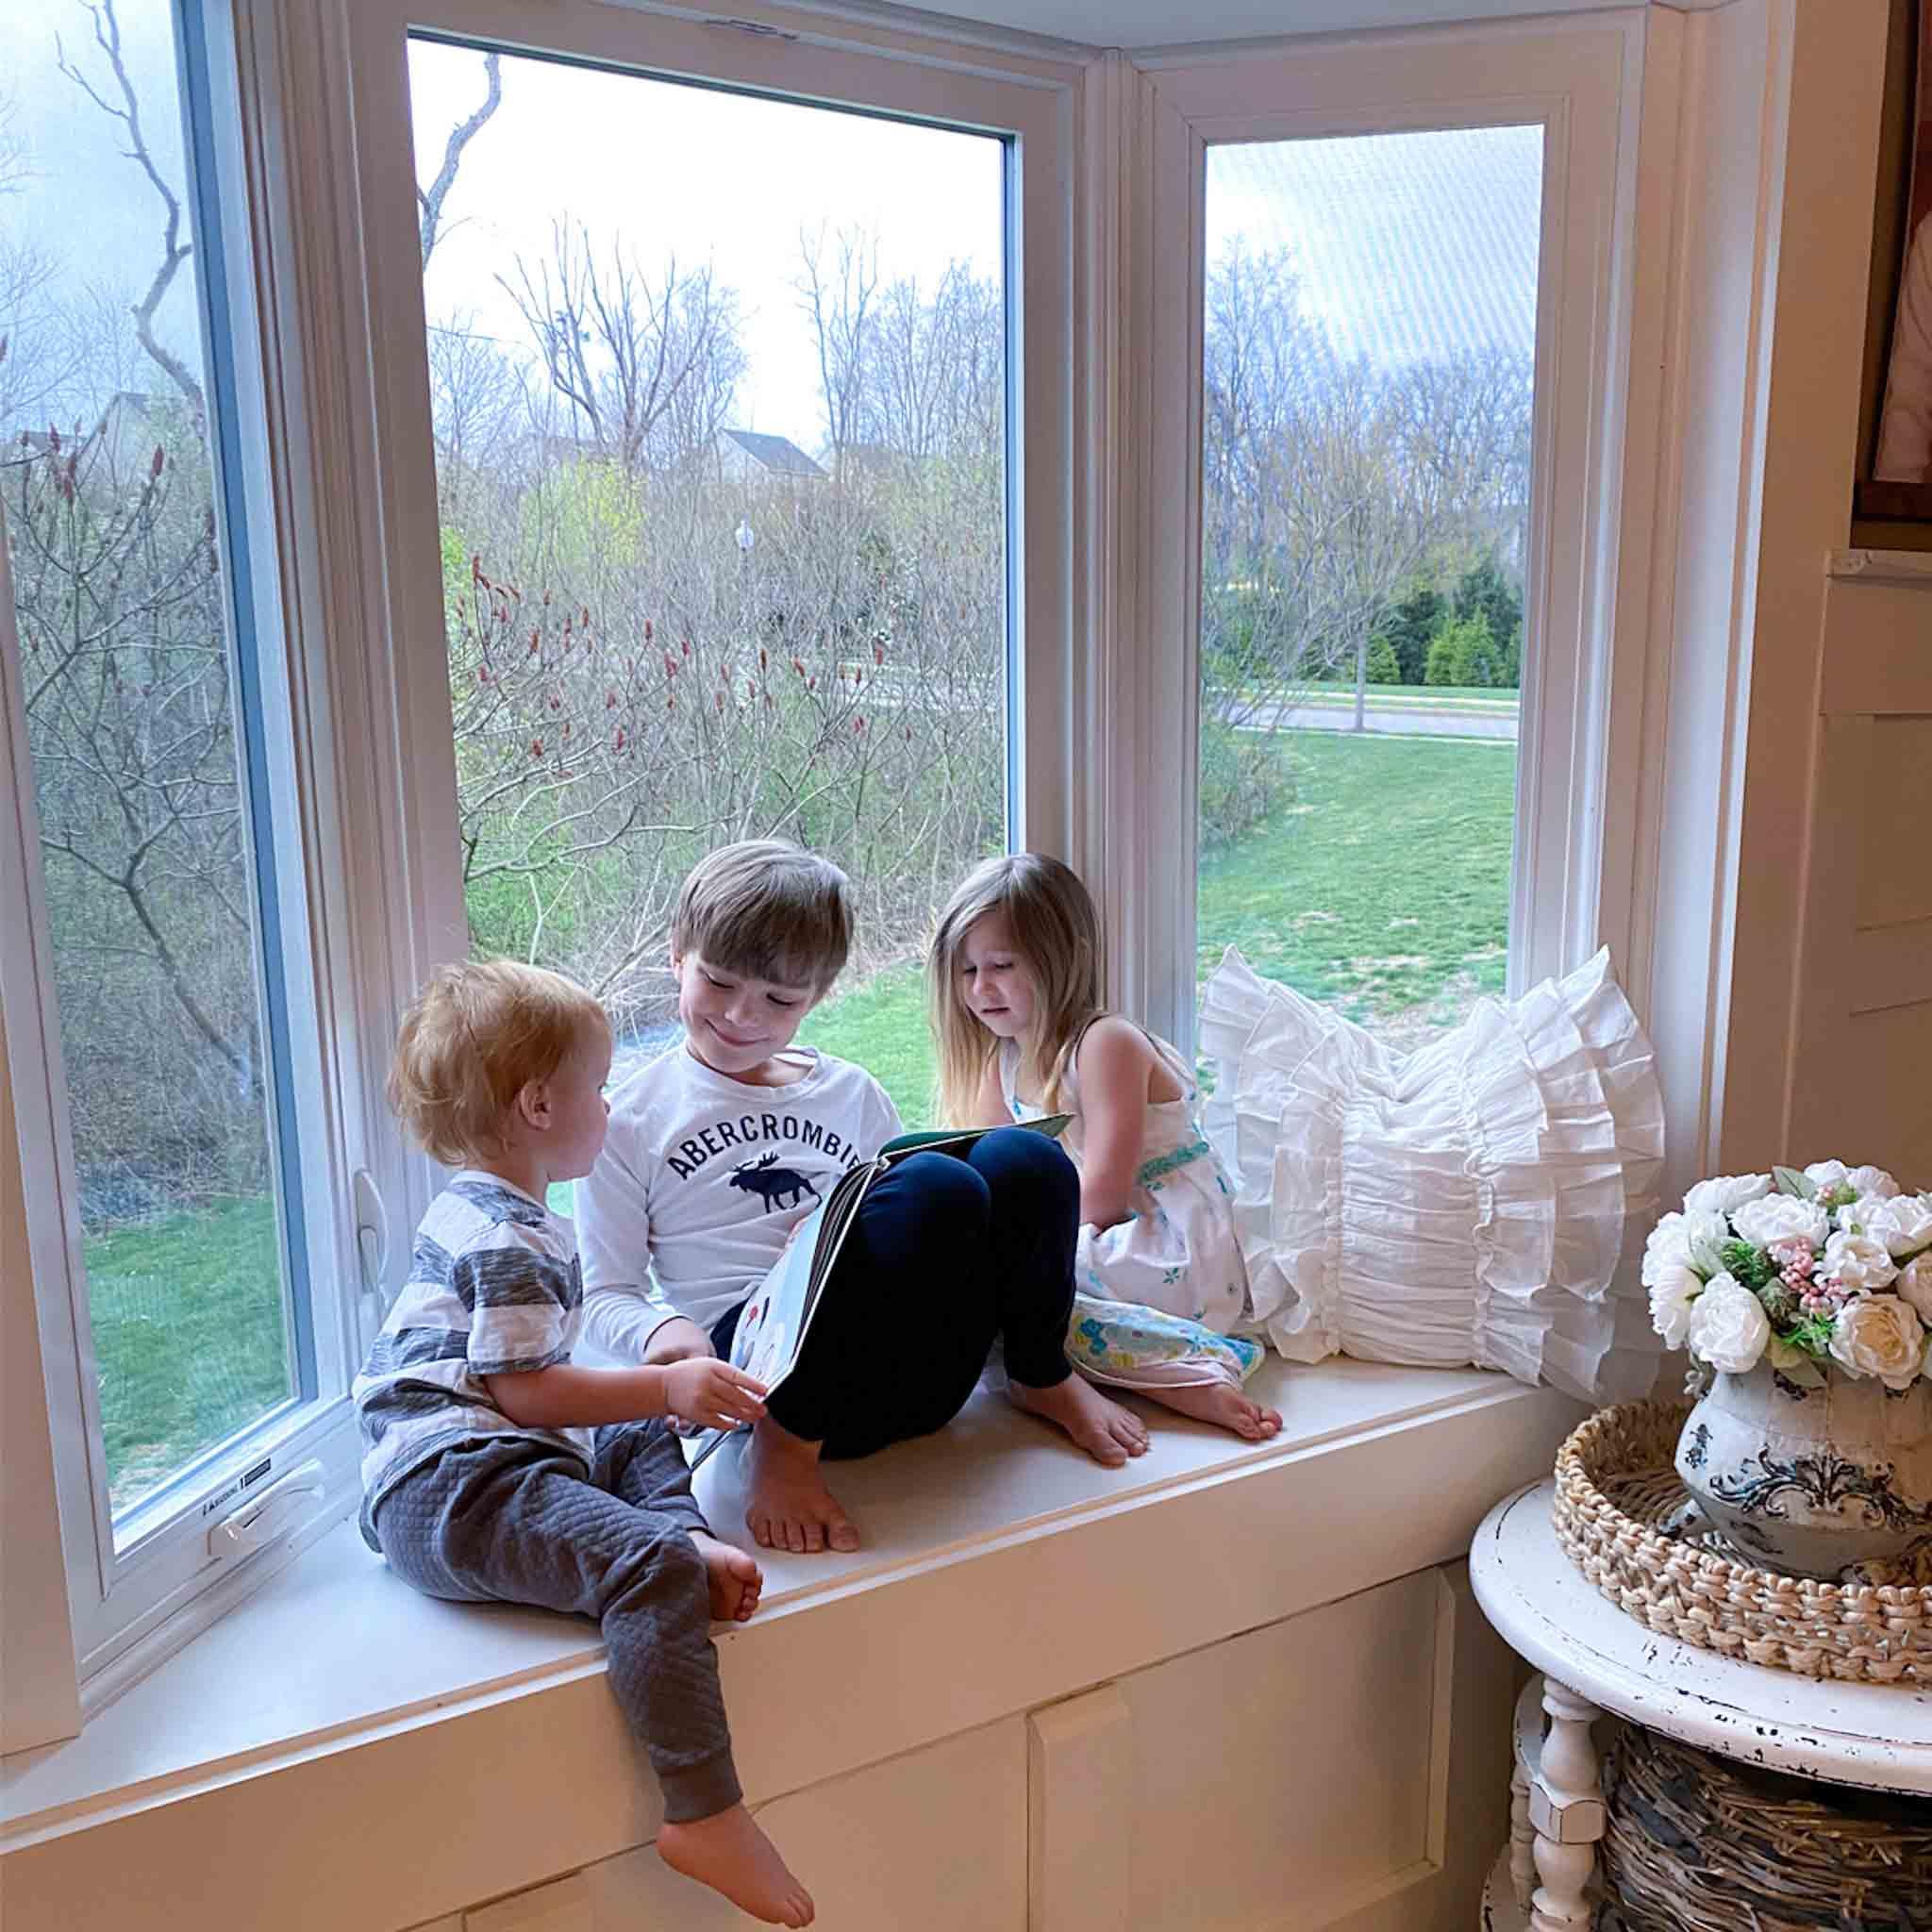 Kids sitting in bay window seat reading a book